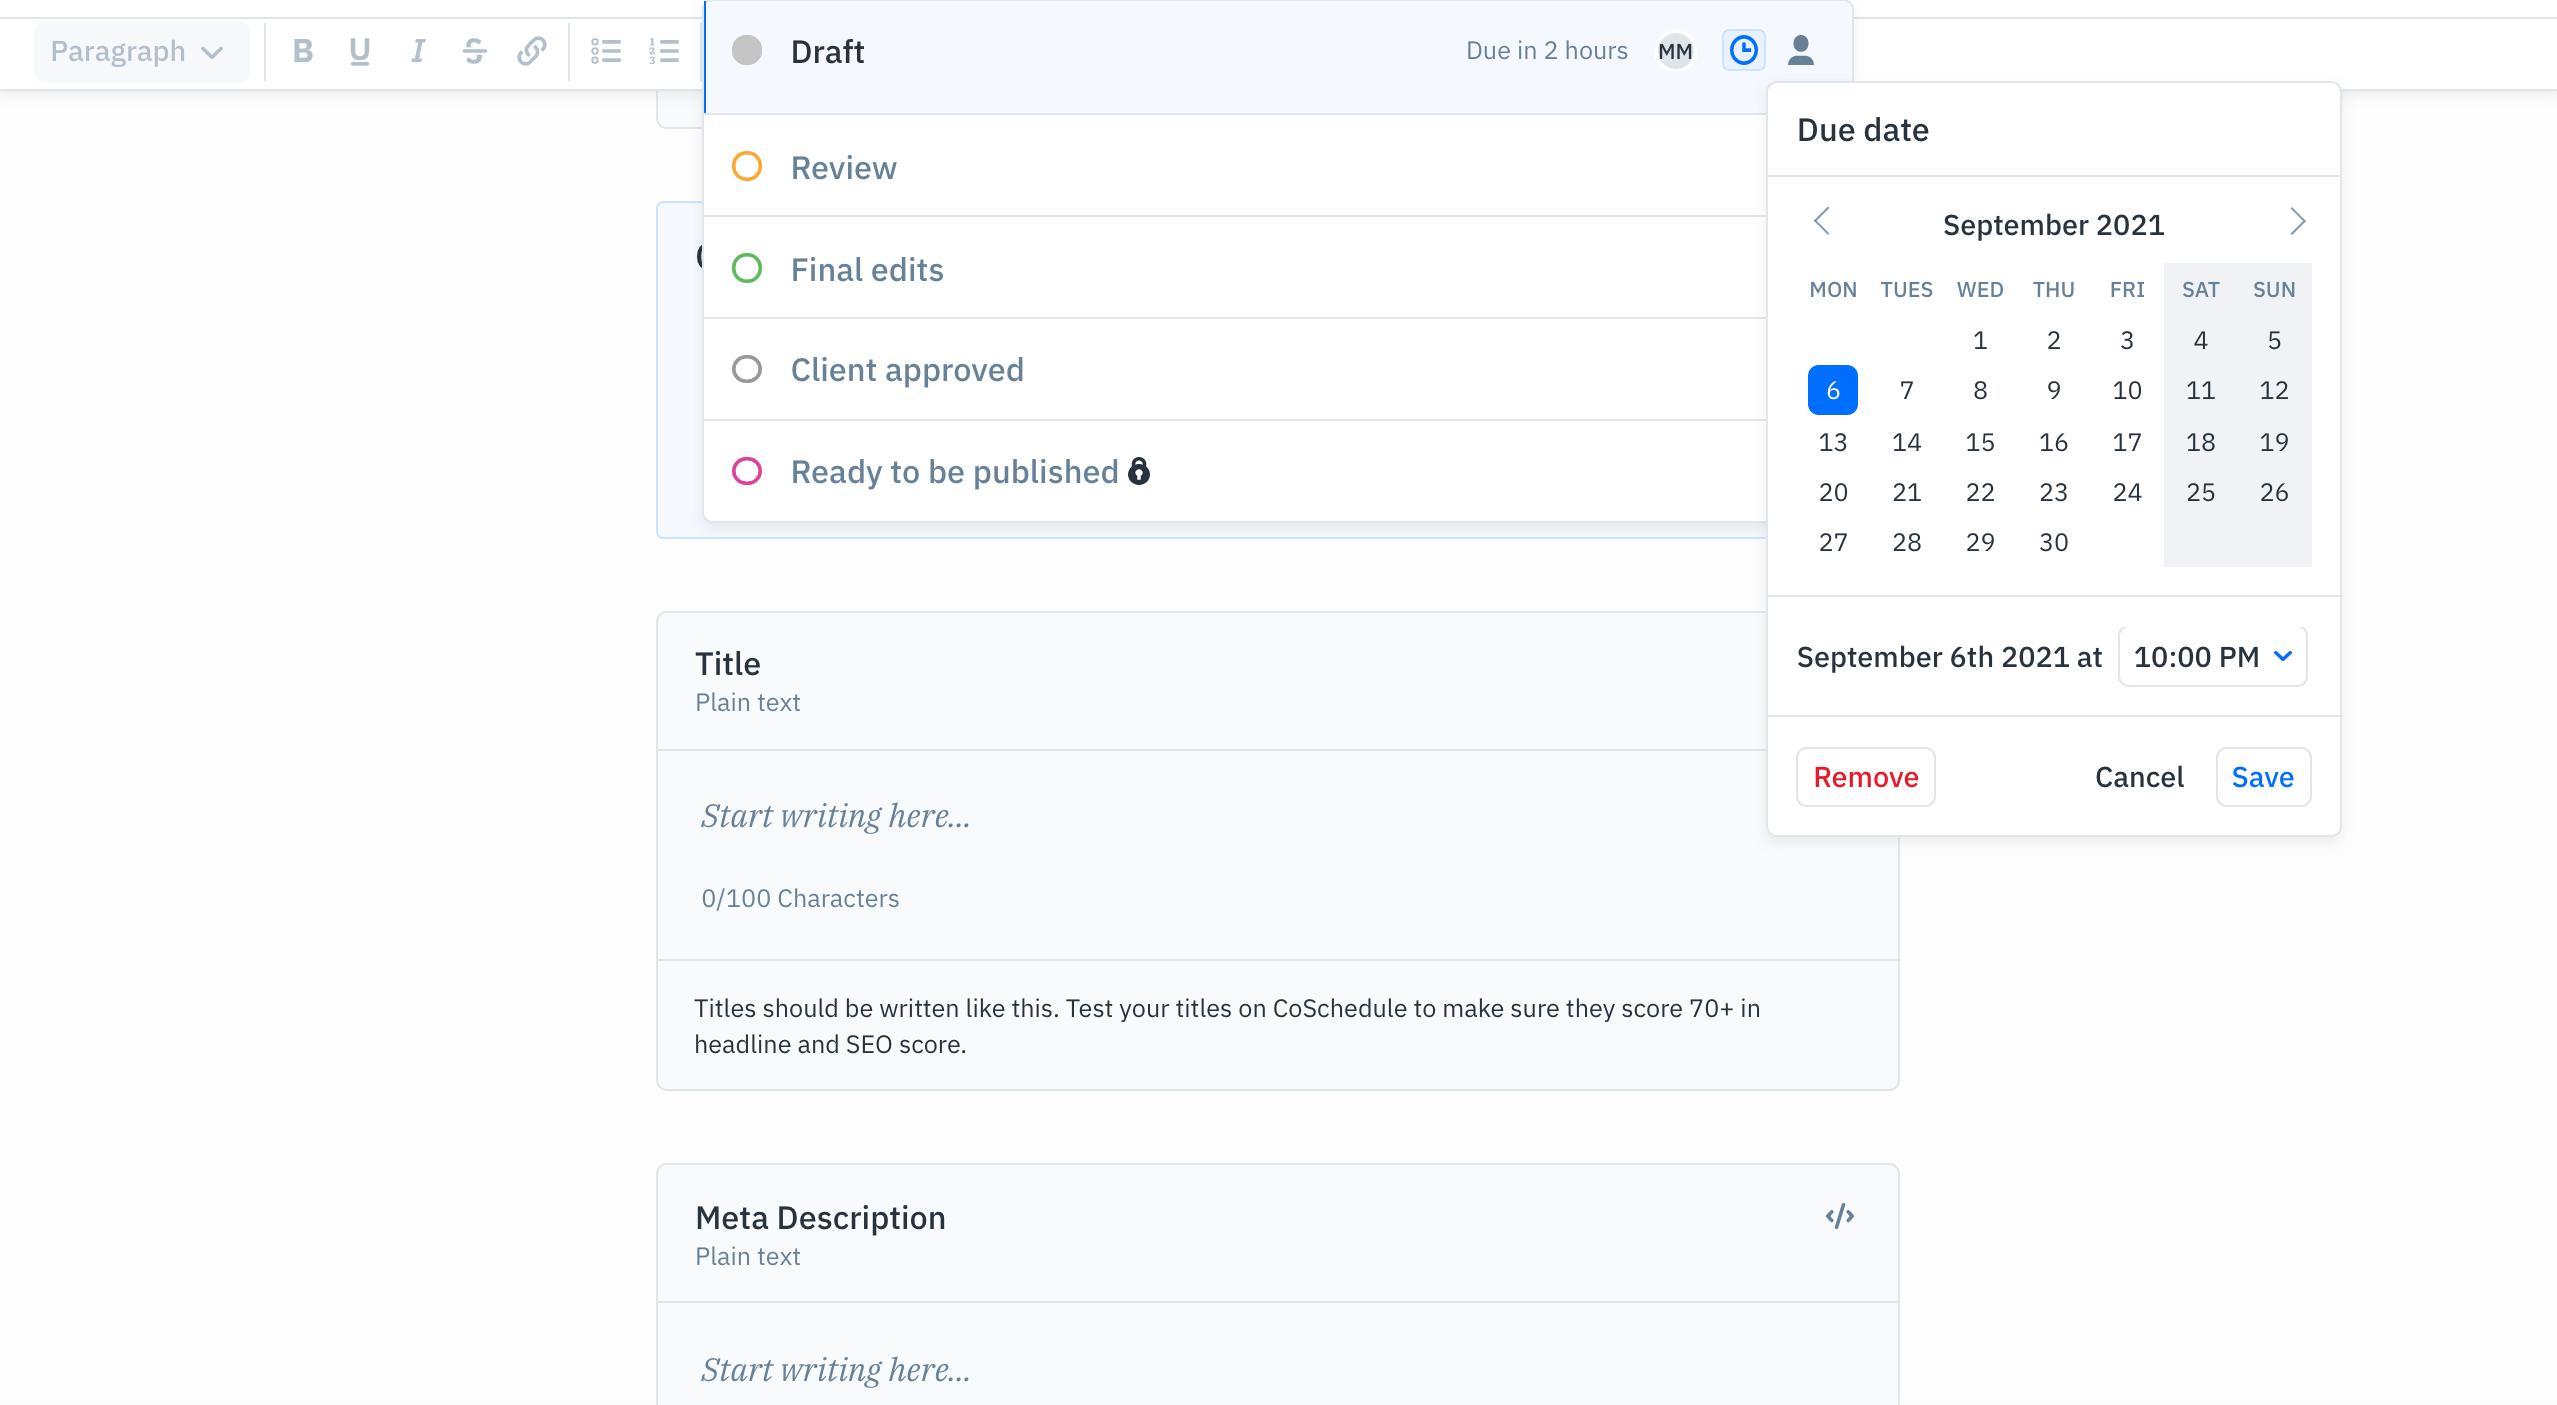 GatherContent workflow status due dates for briefs